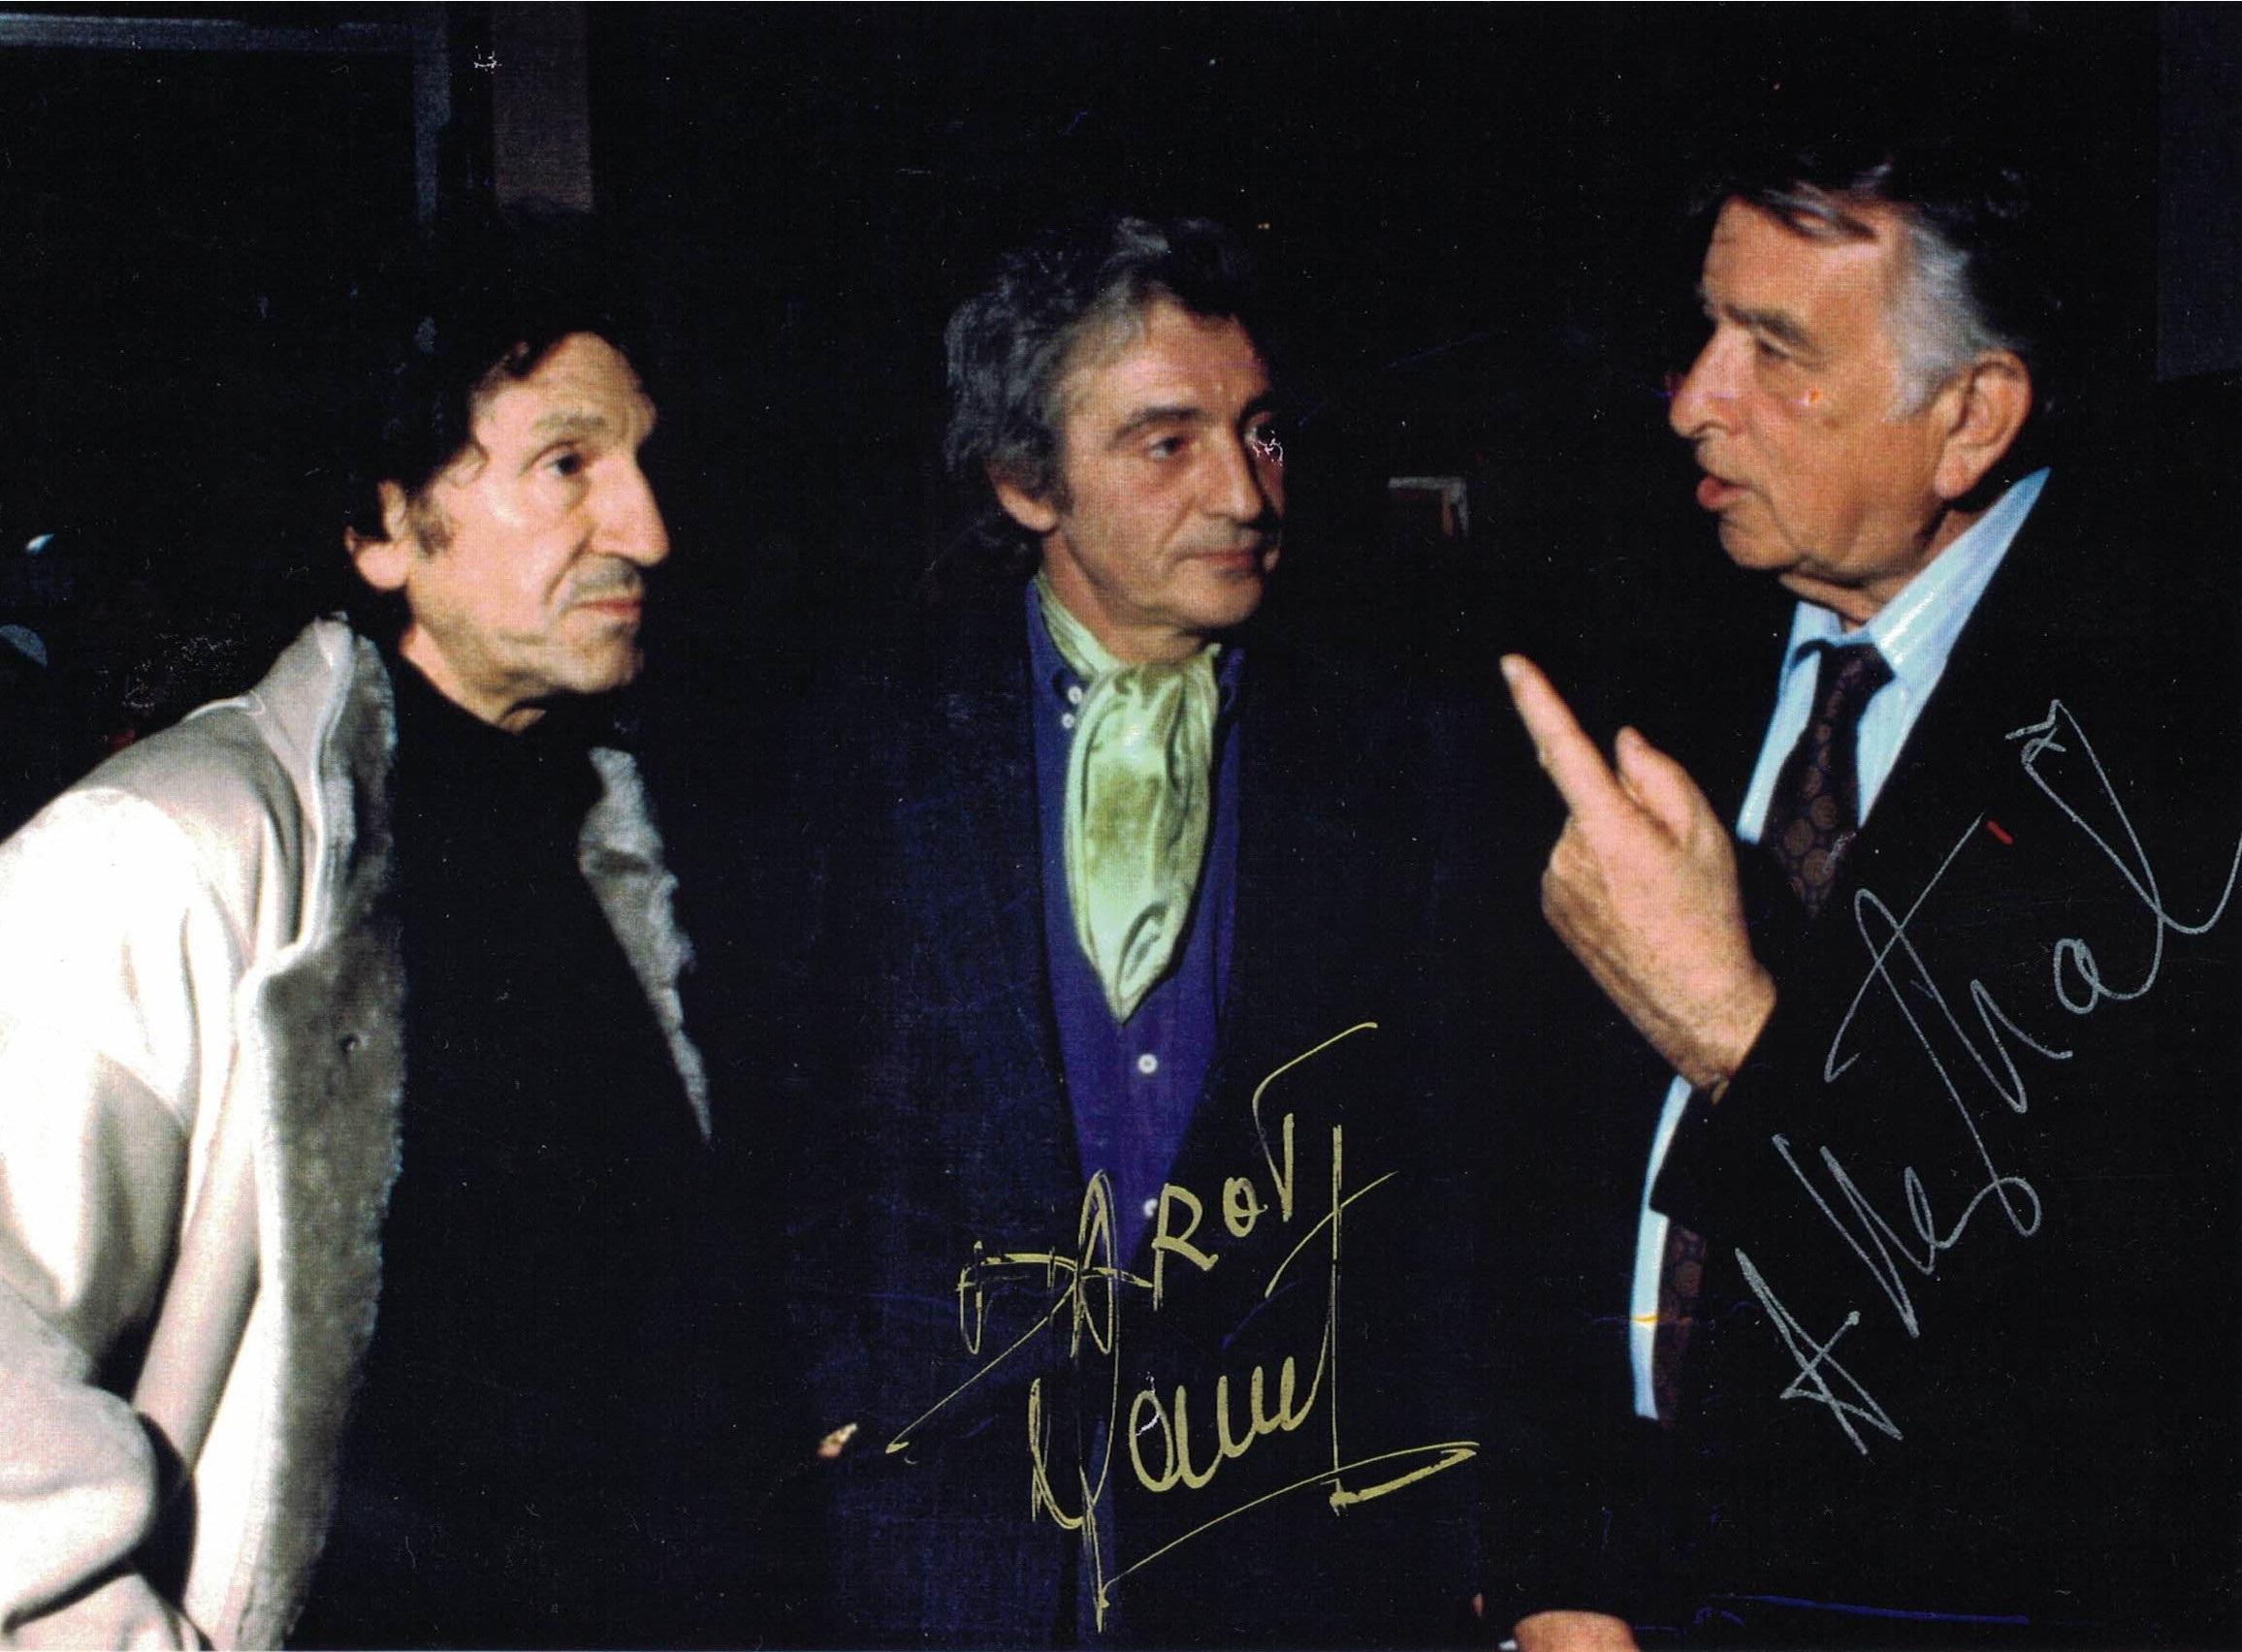 Mouloudji, Darot, Armand Mestral